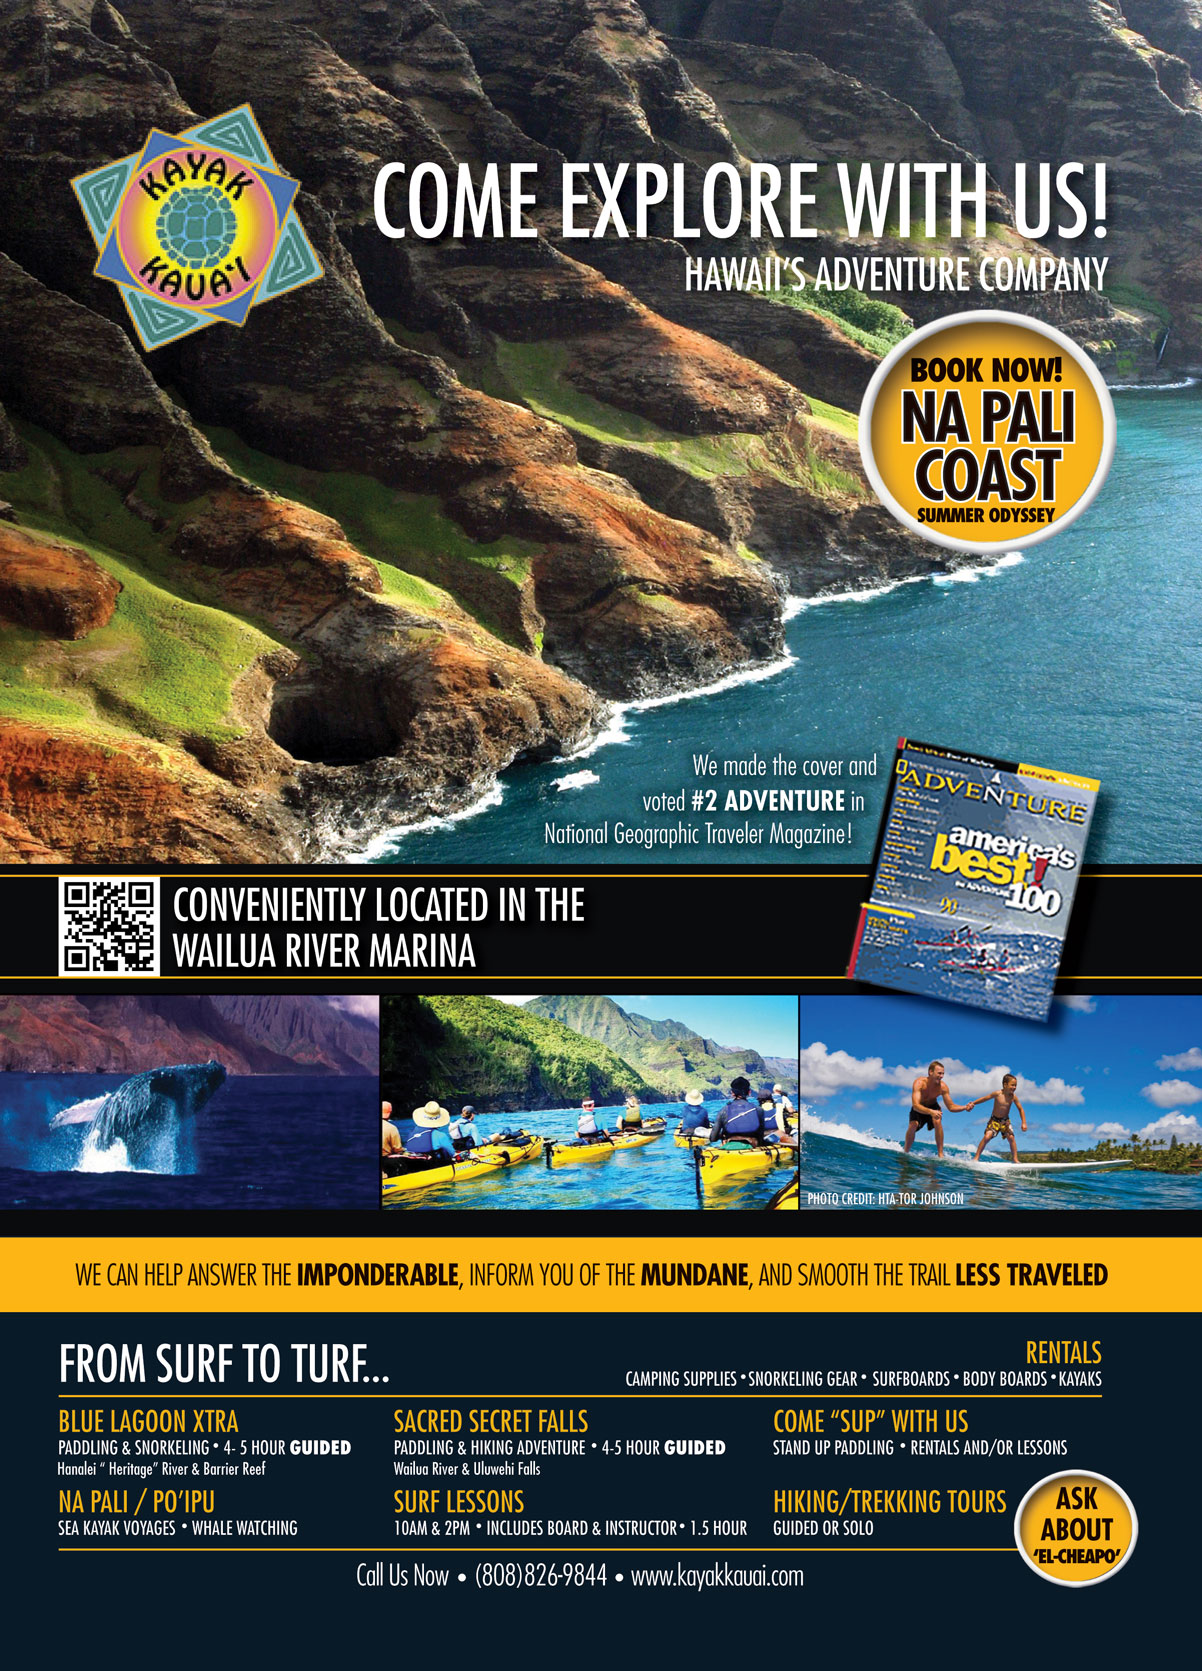 Kayak-Kauai